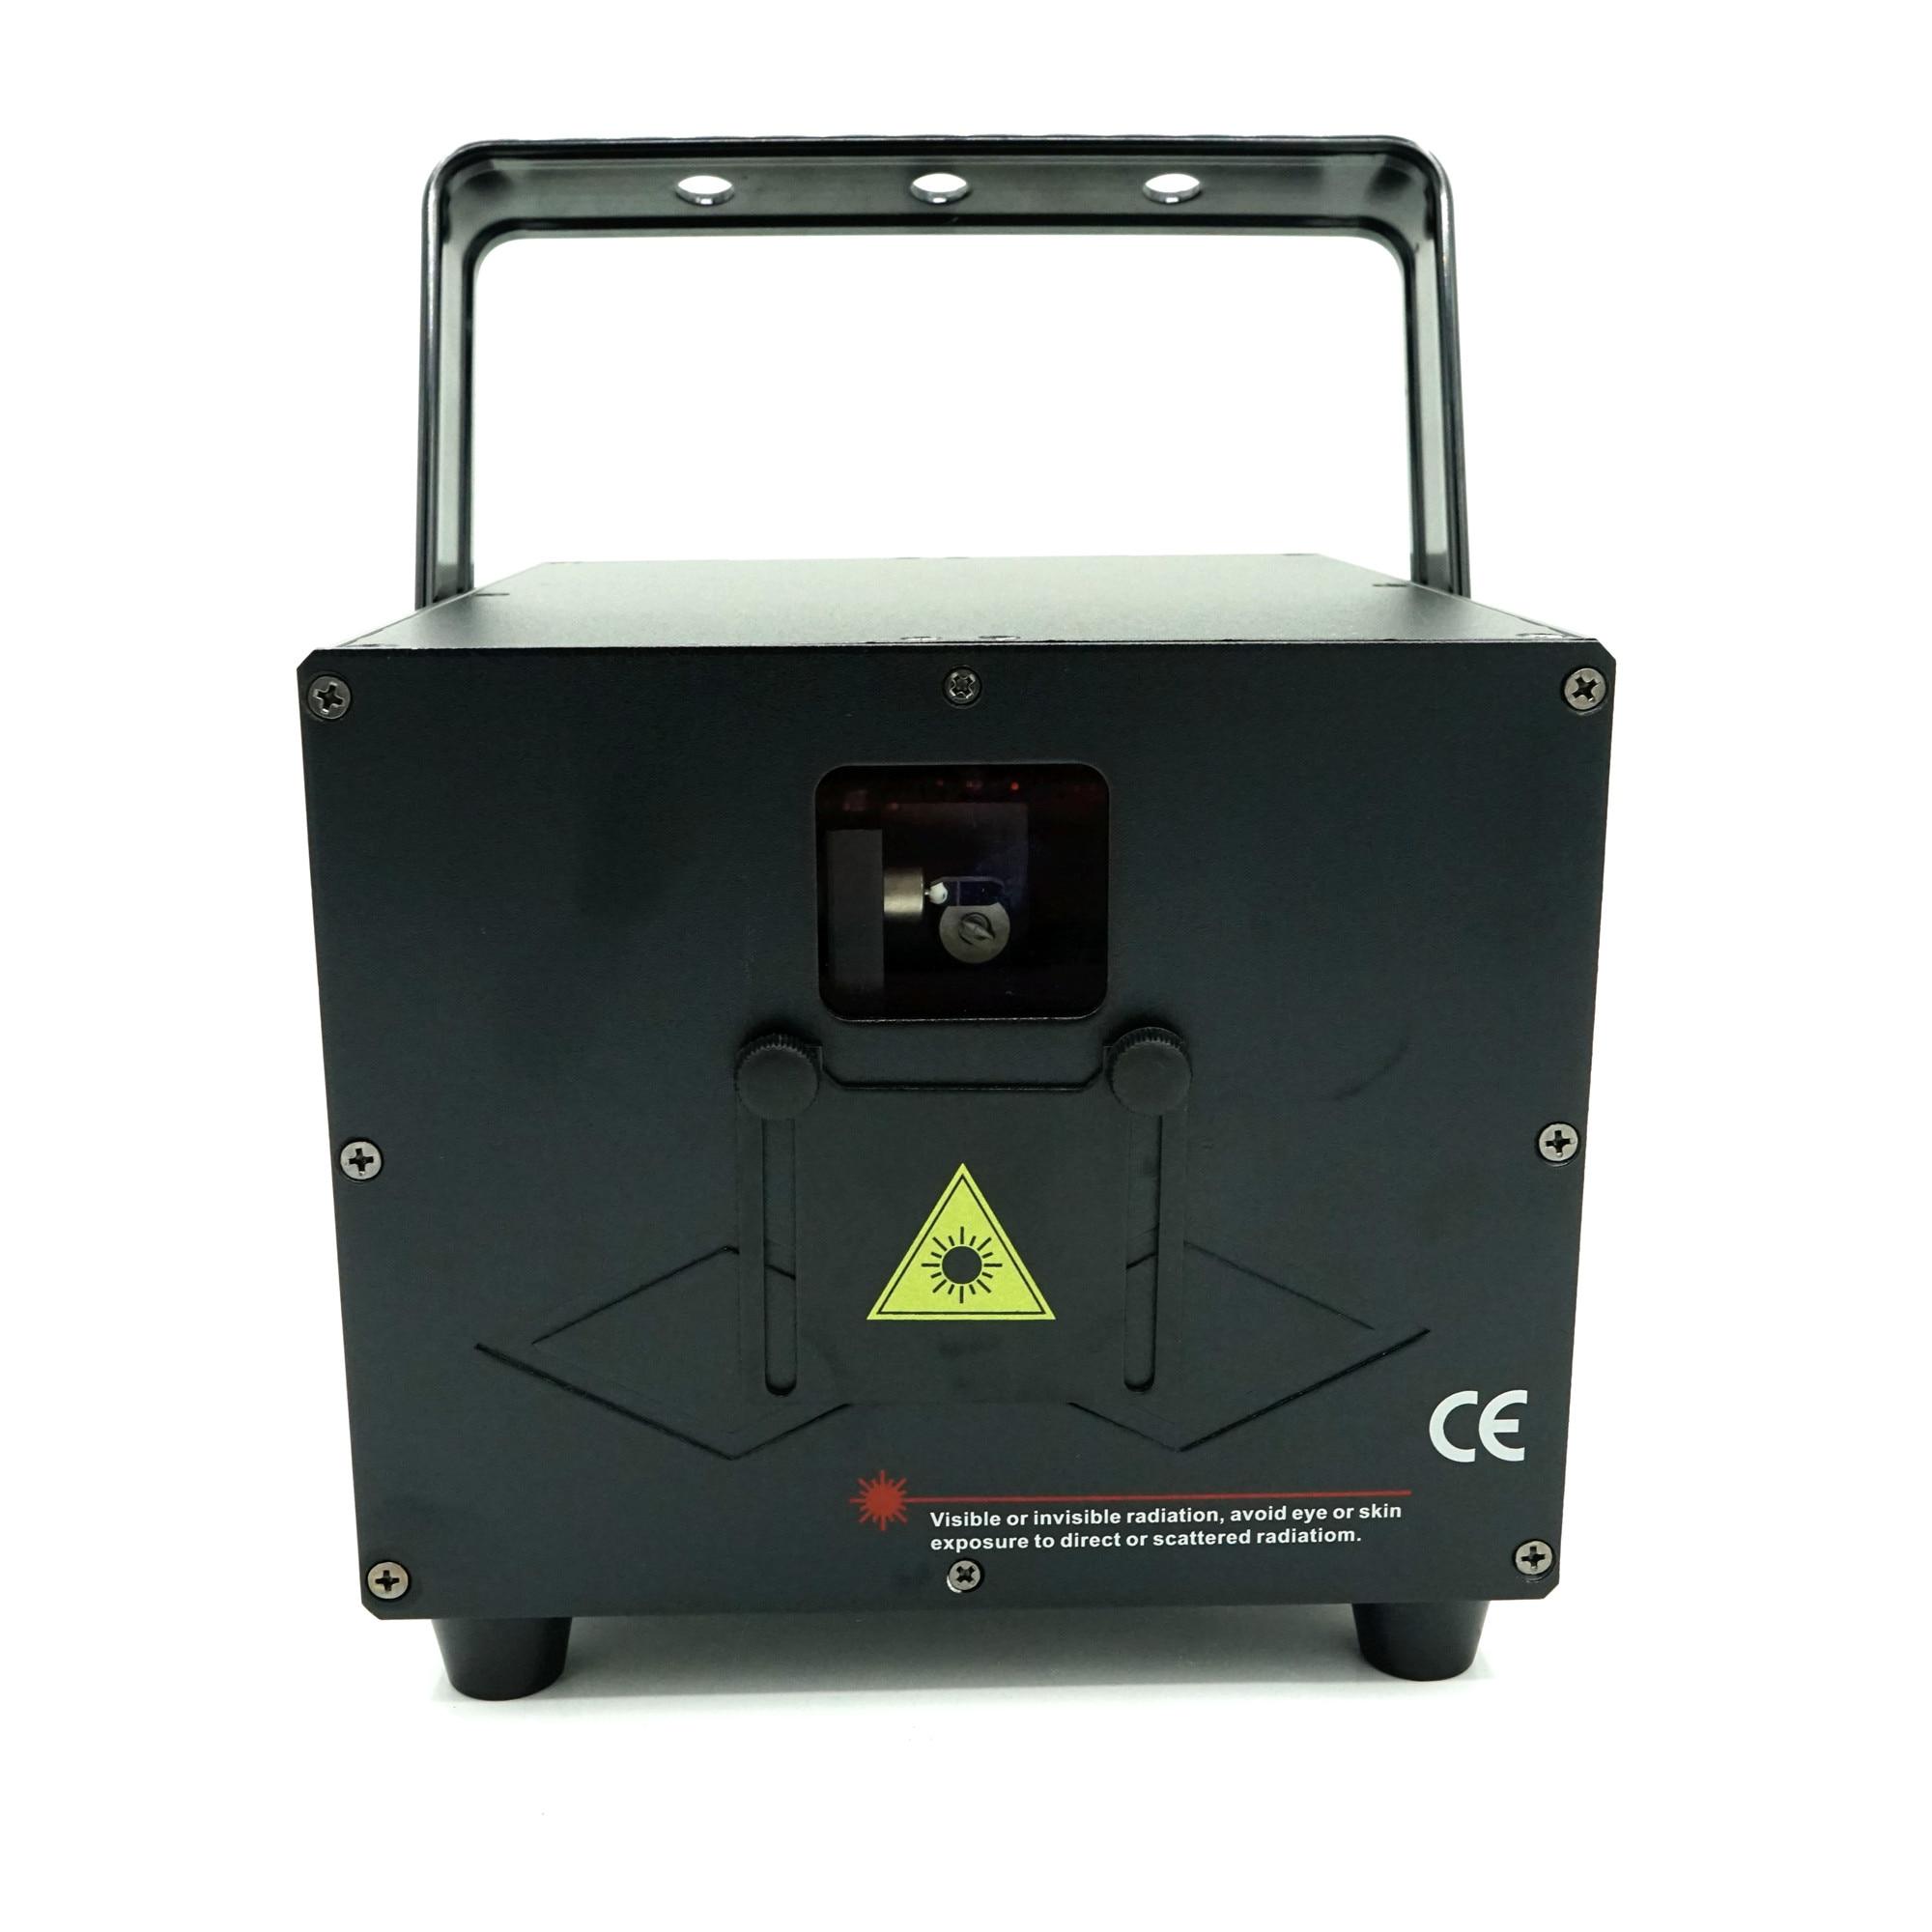 3W full color animation laser Stage Lighting ilda 30-40kpps Red 638nm Beam show system Dmx Dj Disco laser